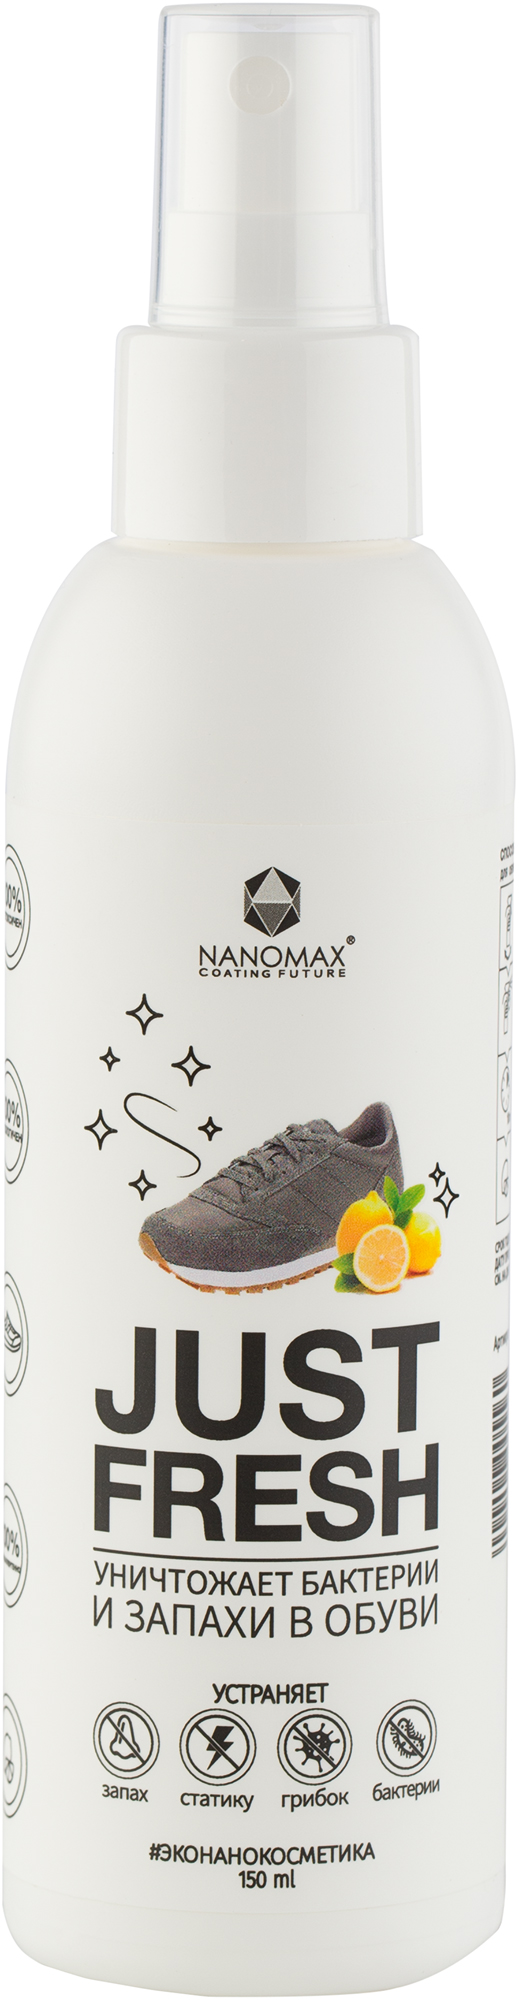 Nanomax Средство уничтожающее бактерии и запахи в обуви